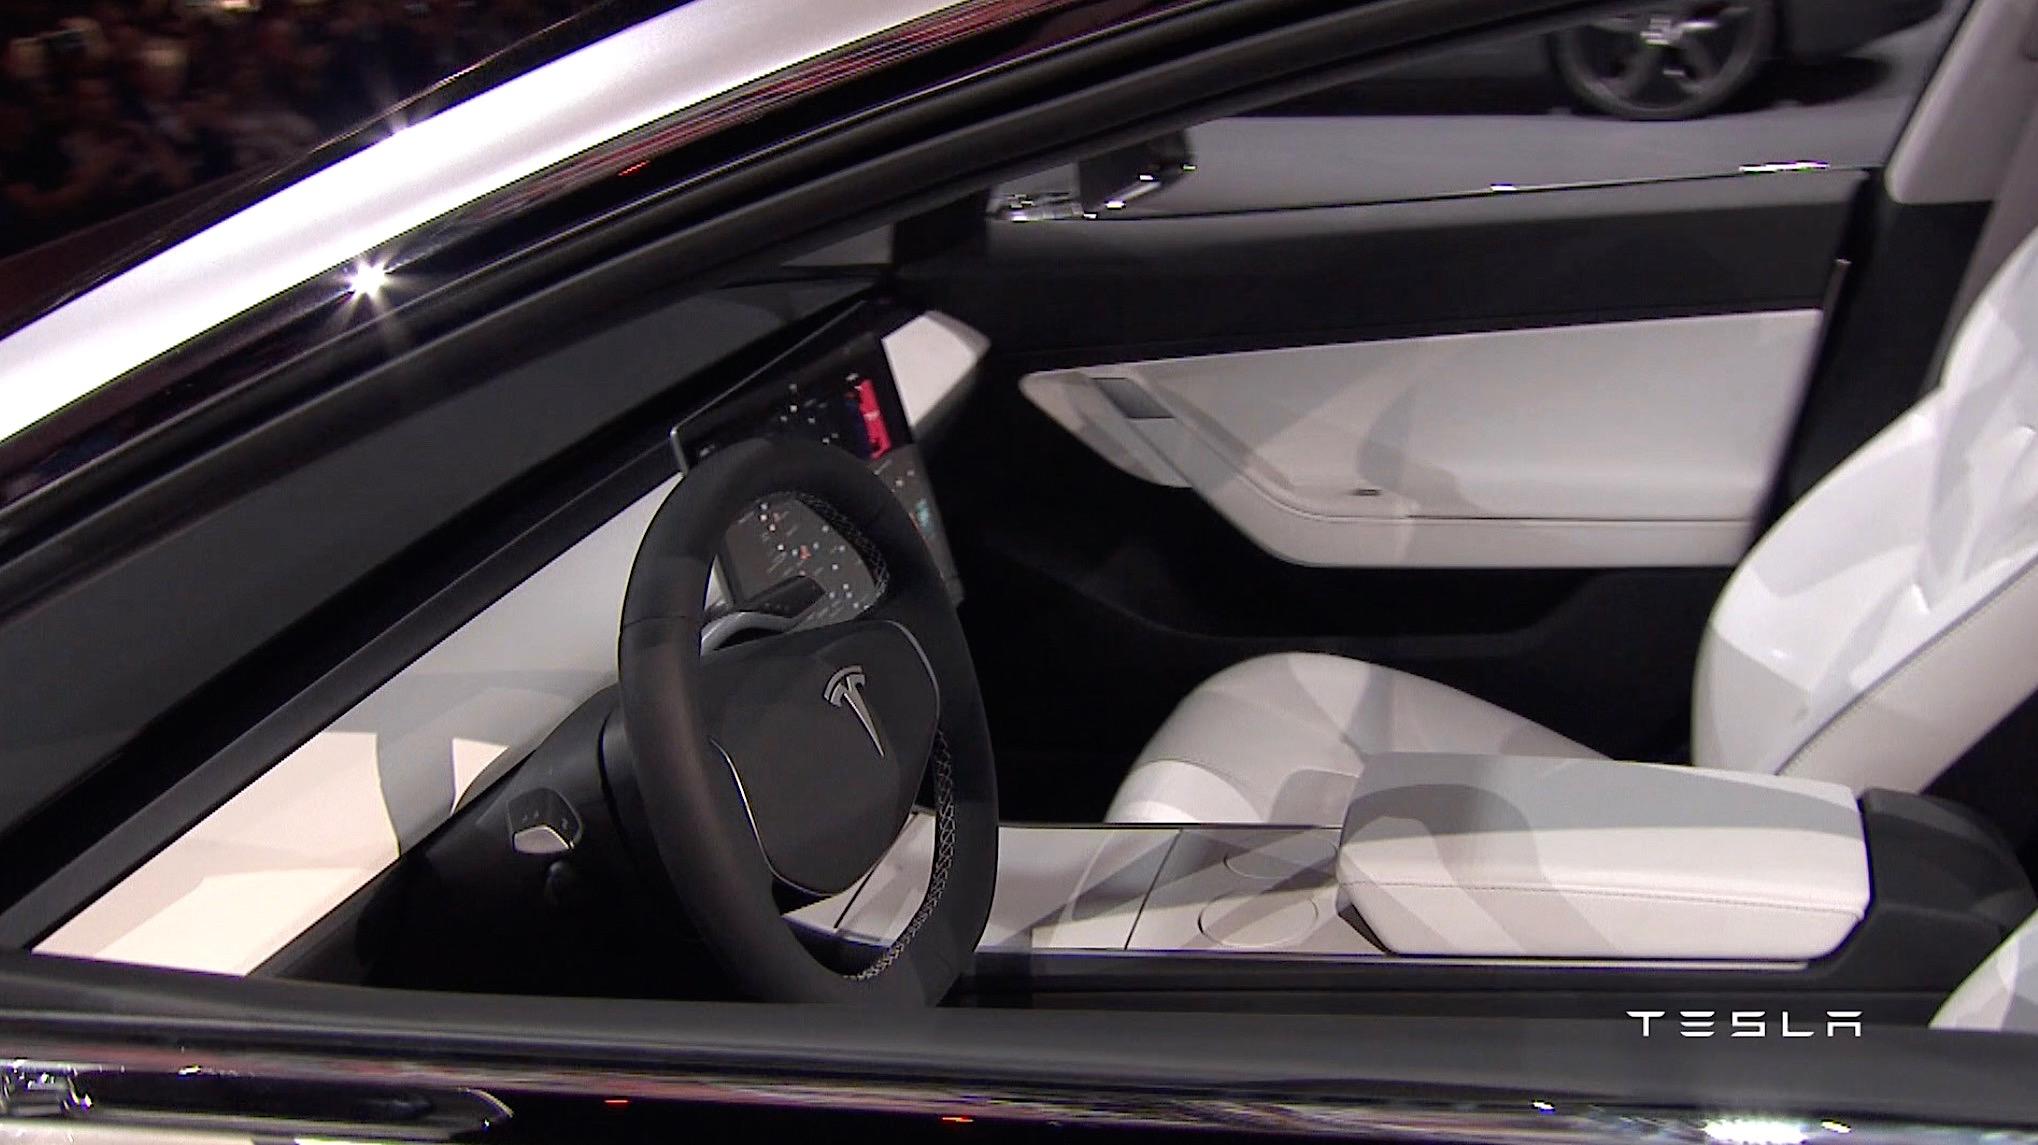 TeslaModelS_interior_interieur1